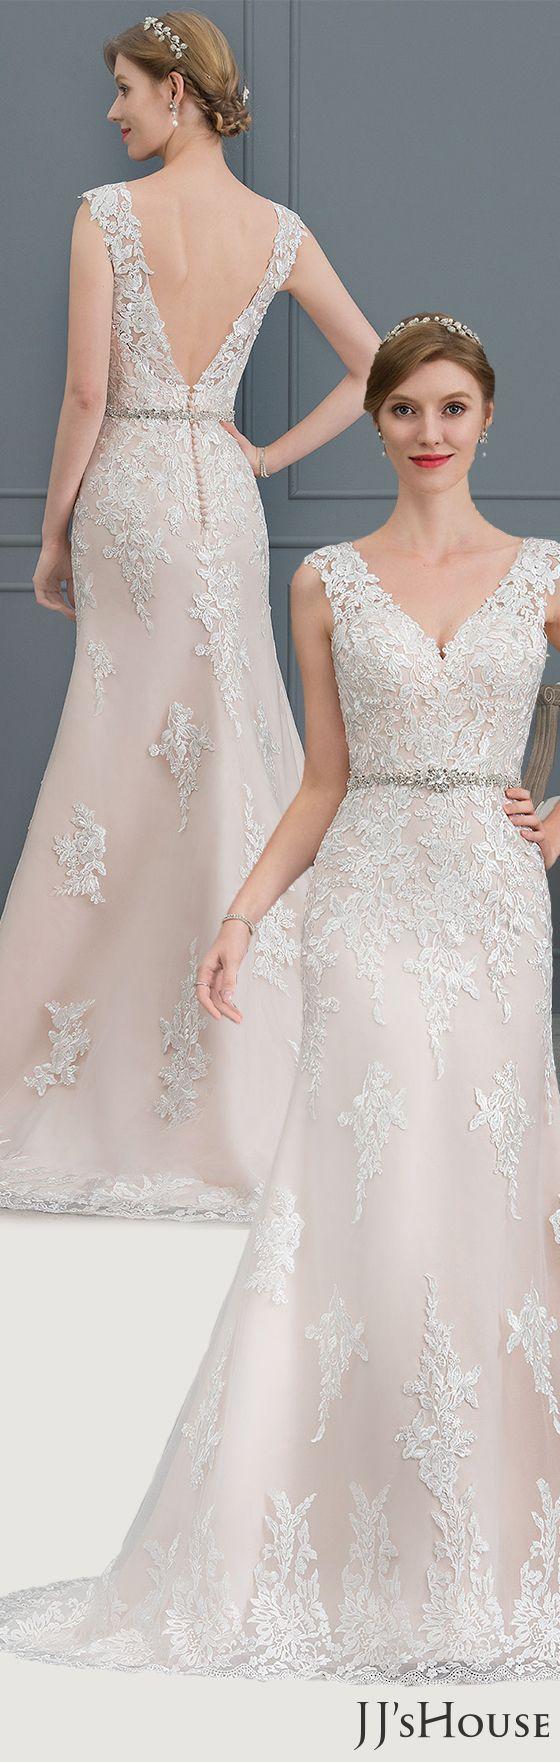 Us 321 00 Trumpet Mermaid V Neck Court Train Tulle Wedding Dress Jj S House Wedding Dresses Tulle Wedding Dress Tulle Wedding [ 1762 x 560 Pixel ]